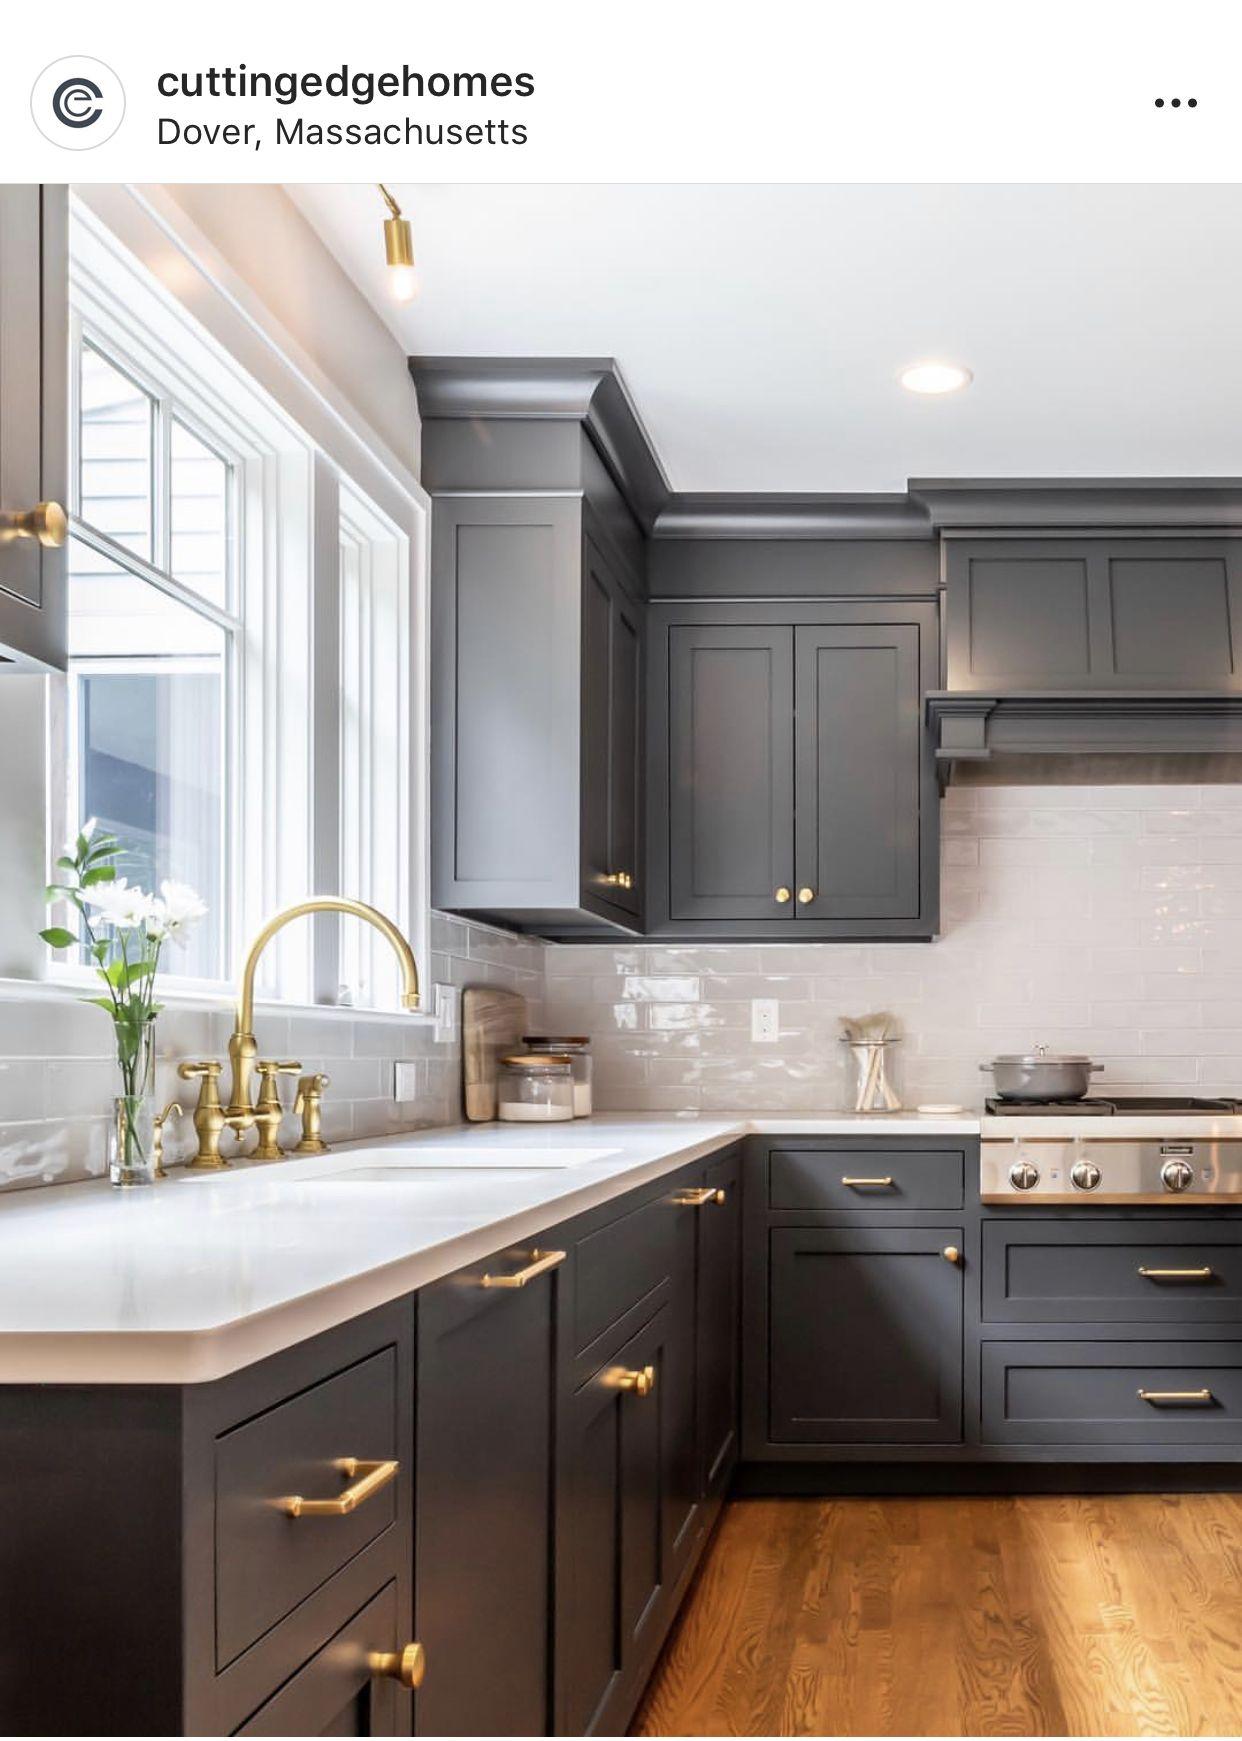 Benjamin Moore Wrought Iron In 2020 Diy Kitchen Renovation Grey Kitchen Cabinets Kitchen Design